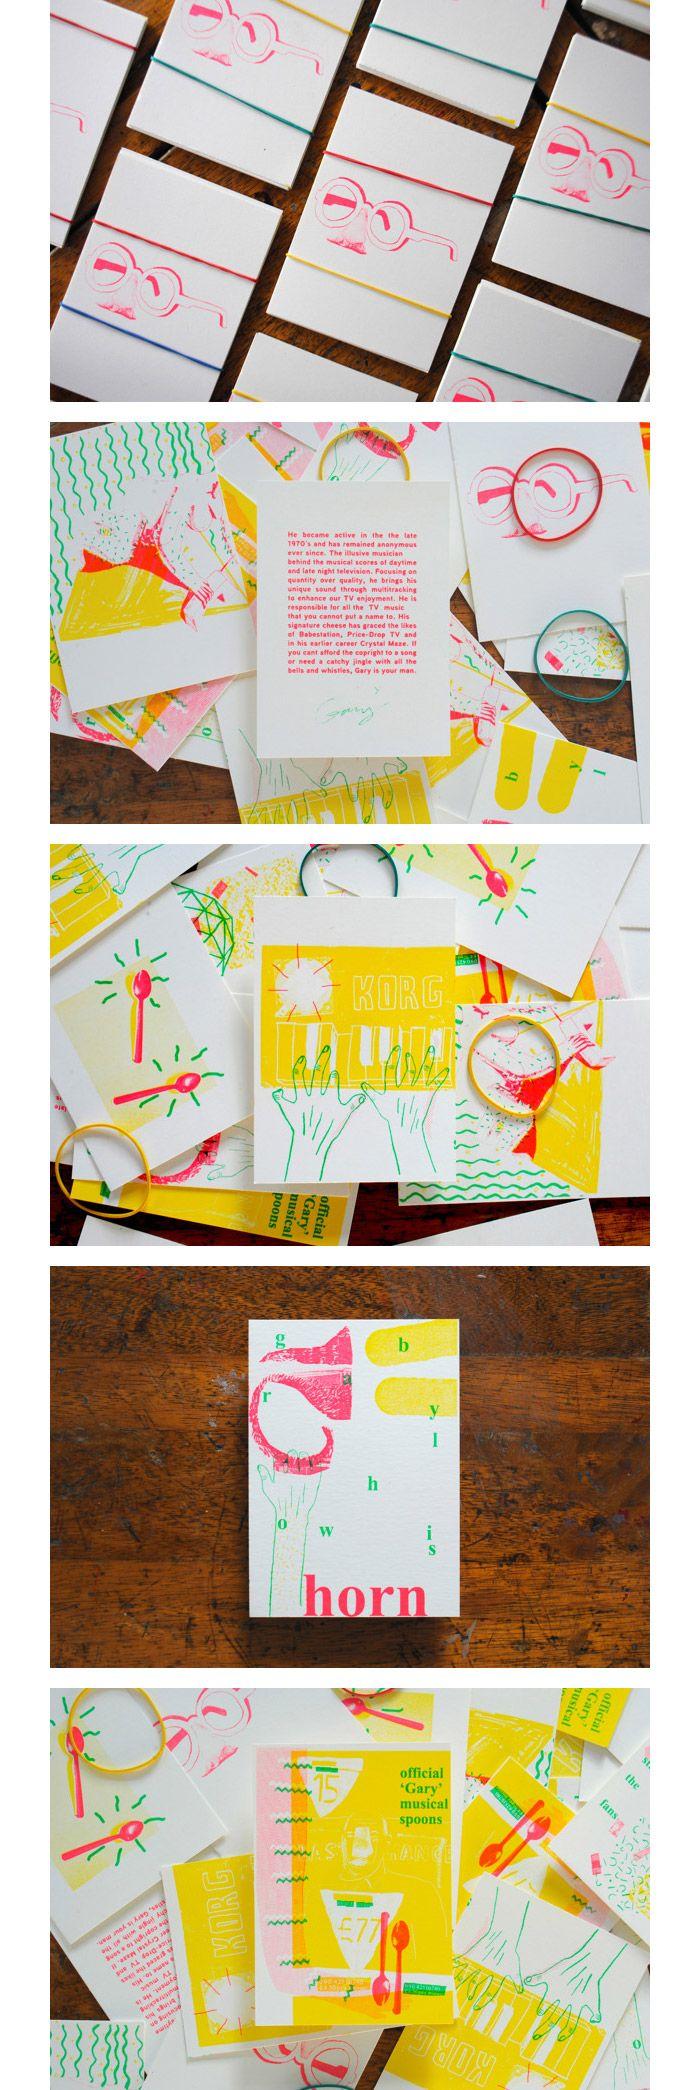 Oliver Elliott & Alex Penny / Illustration & silkscreened postcards - Gary the Musical Enigma